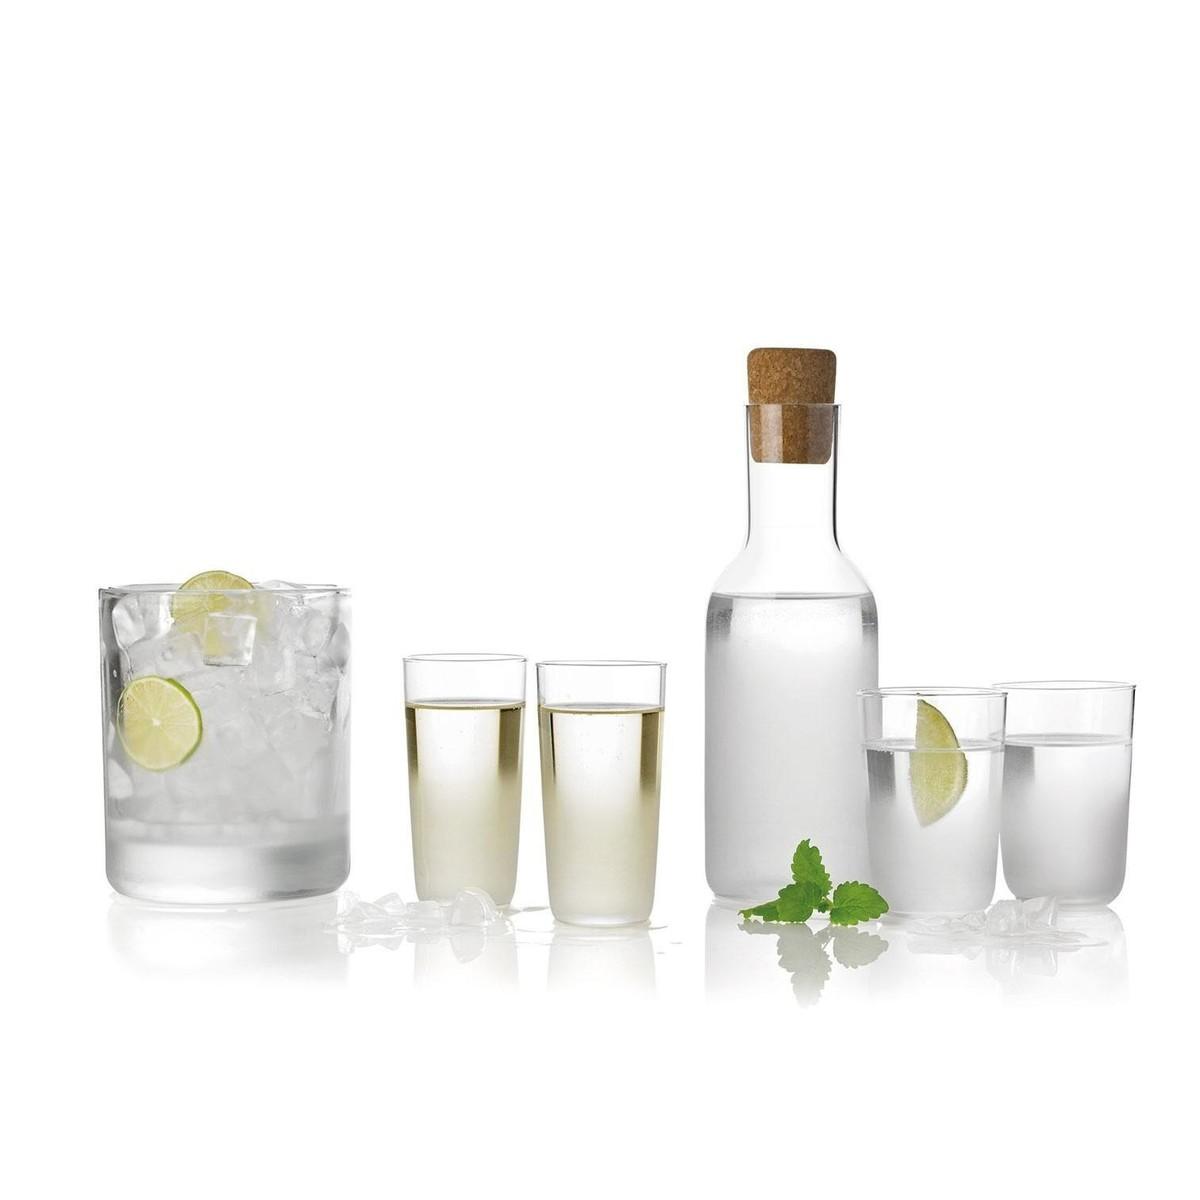 frost set de verres n 2 stelton verres ustensiles cuisine accessoires. Black Bedroom Furniture Sets. Home Design Ideas